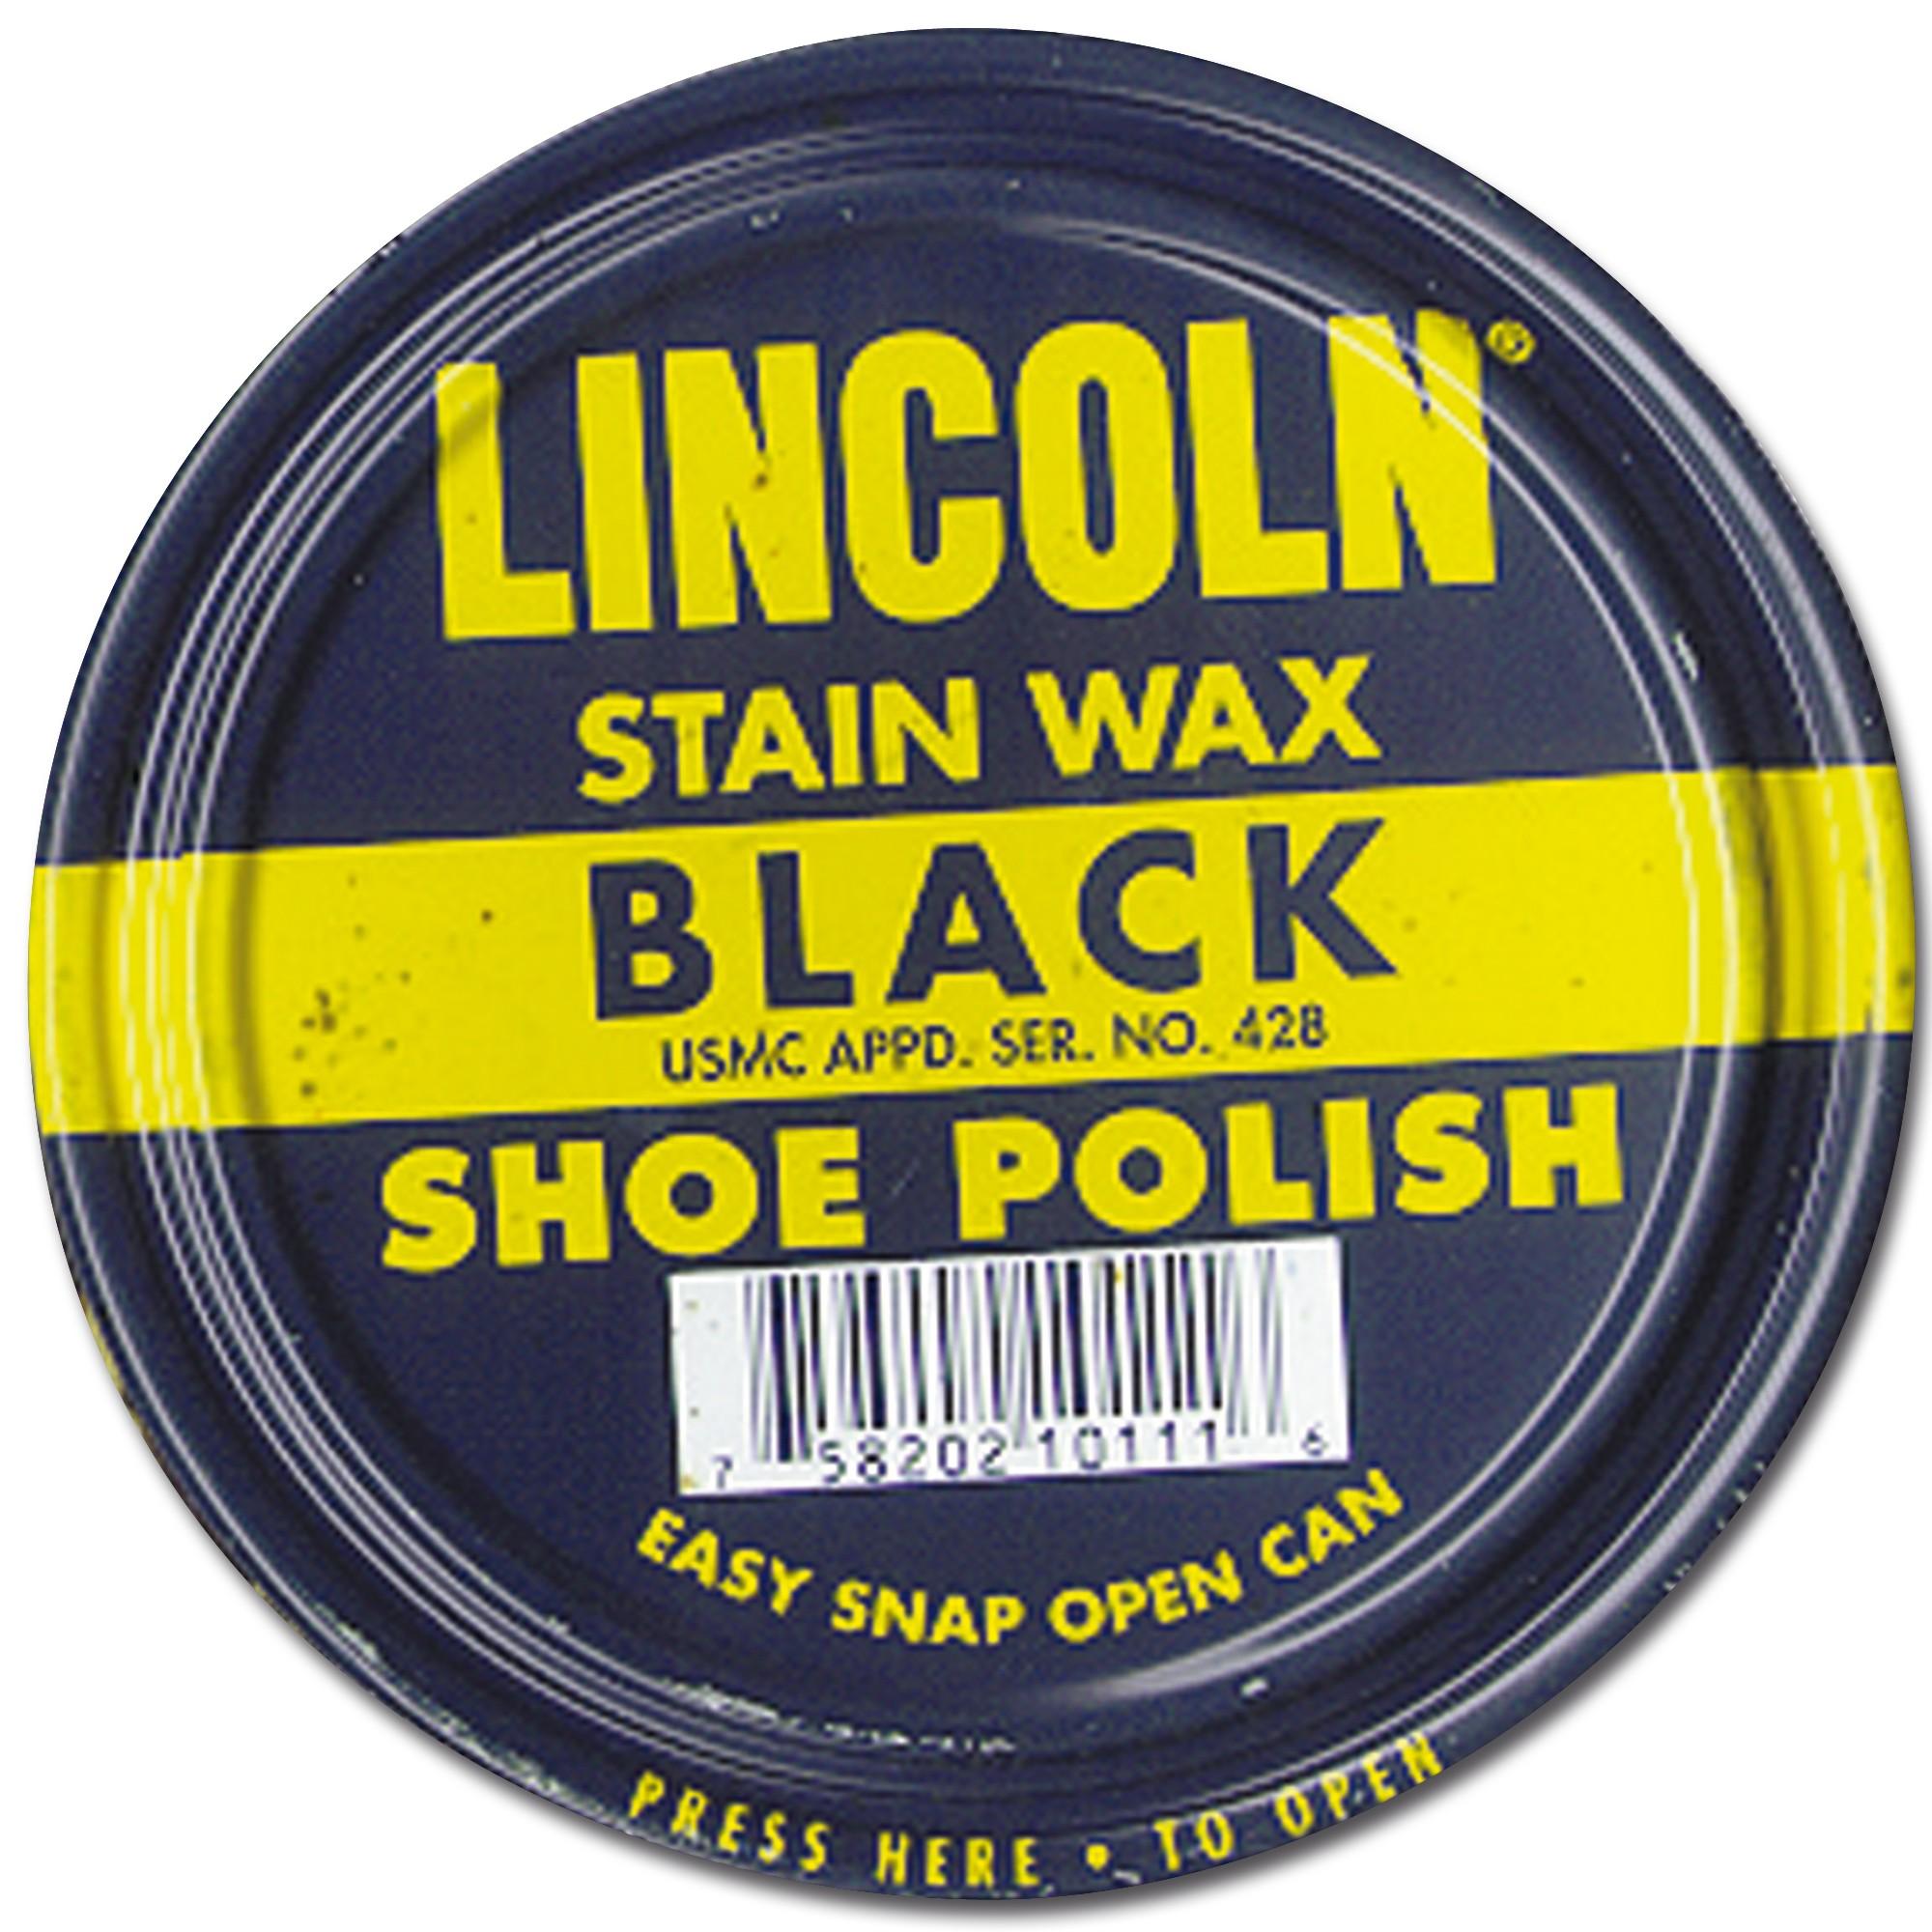 Shoe Polish Lincoln Stain Wax black